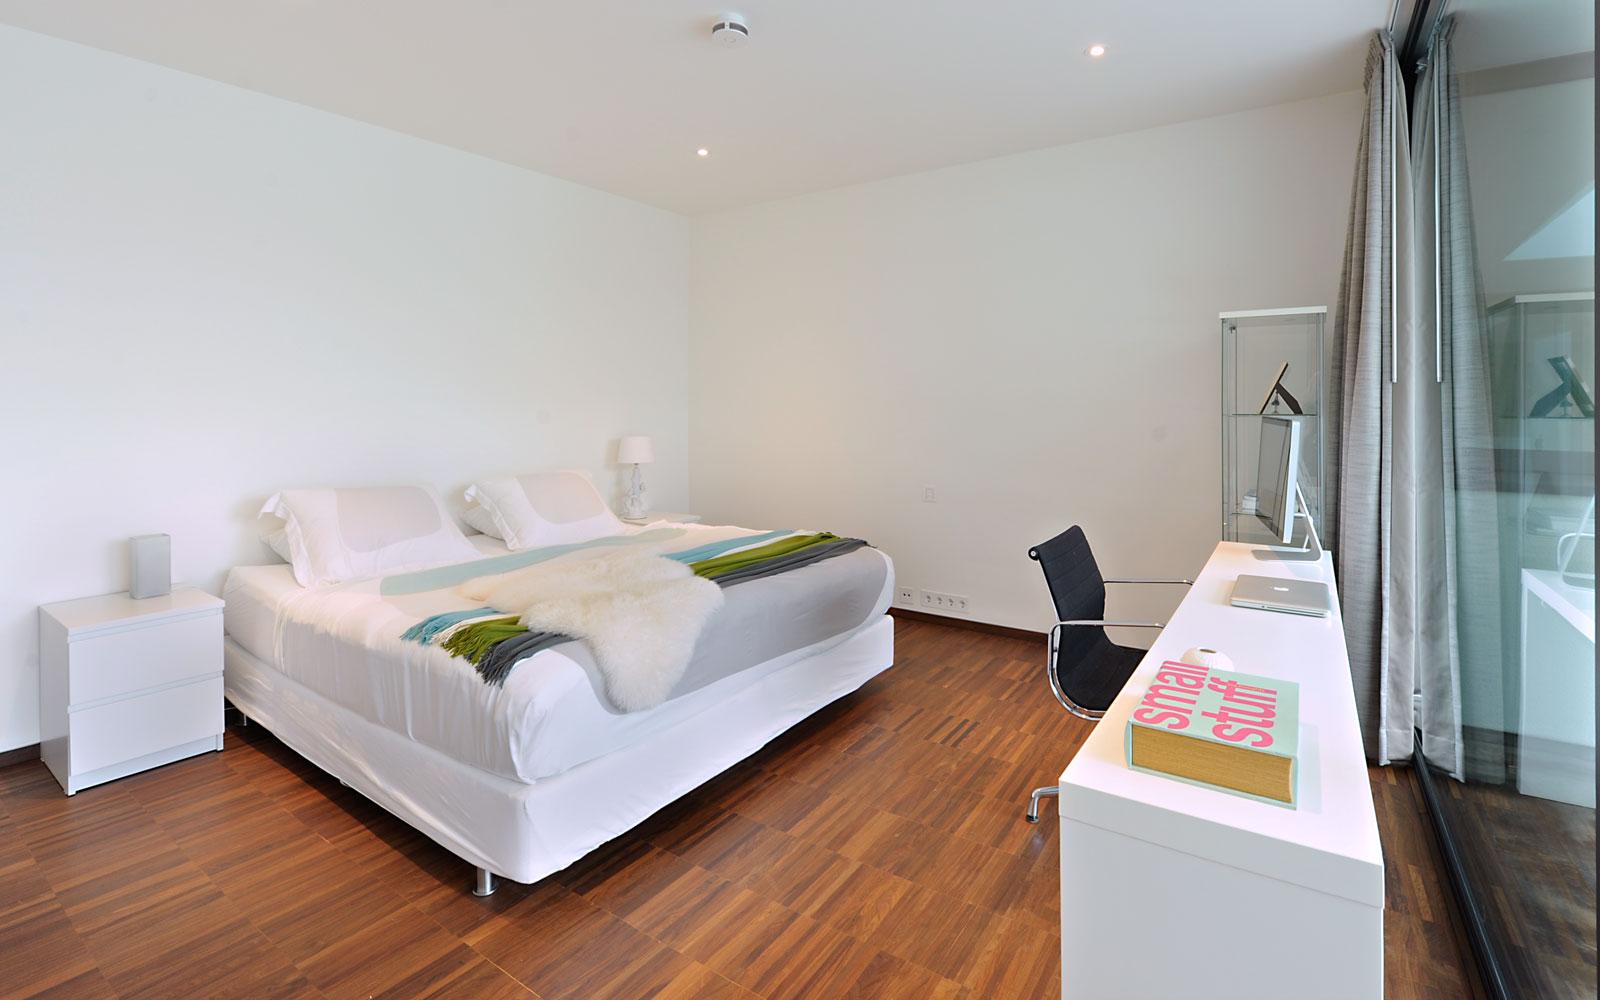 Slaapkamer, tweepersoonsbed, houten vloer, strak, modern landhuis, Maas Architecten